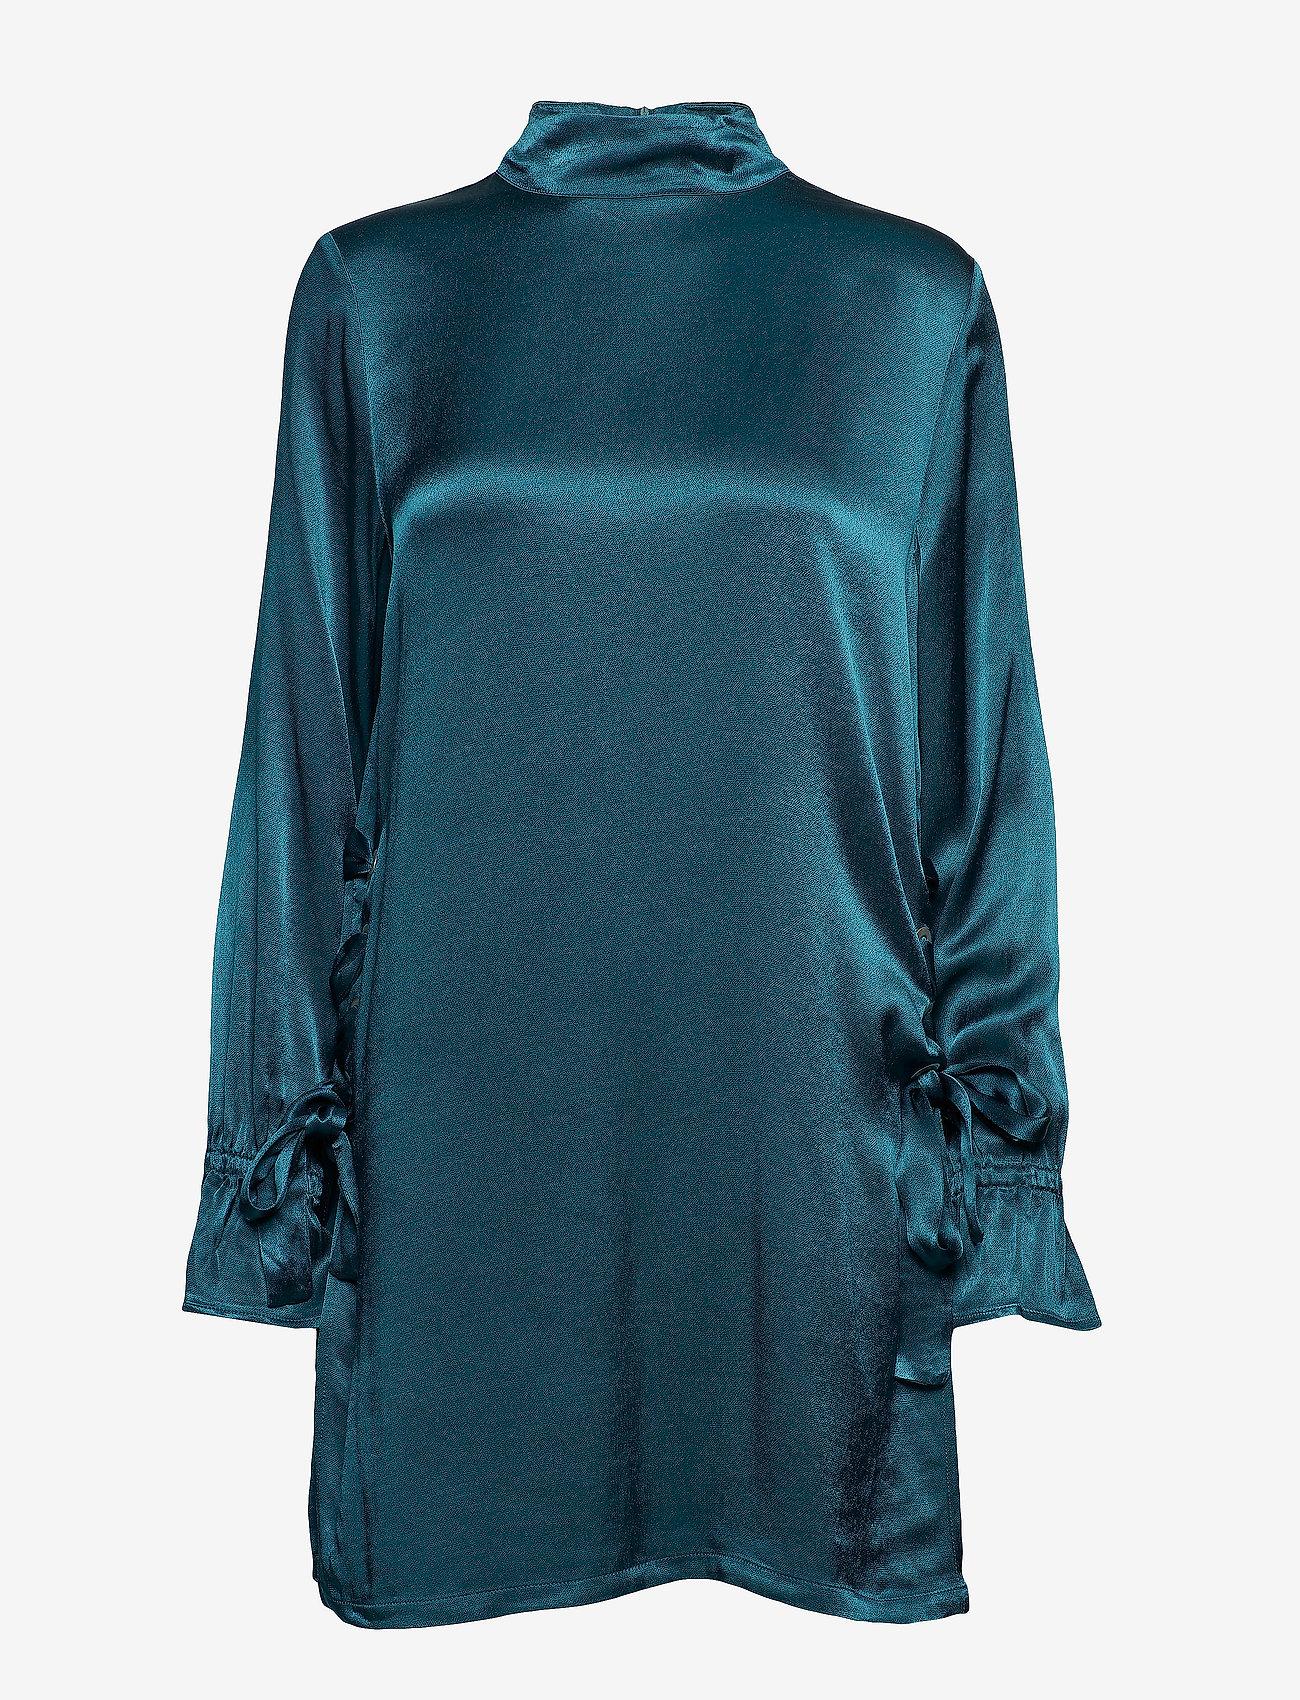 Minus Gwyneth dress - Dresses FIR GREEN